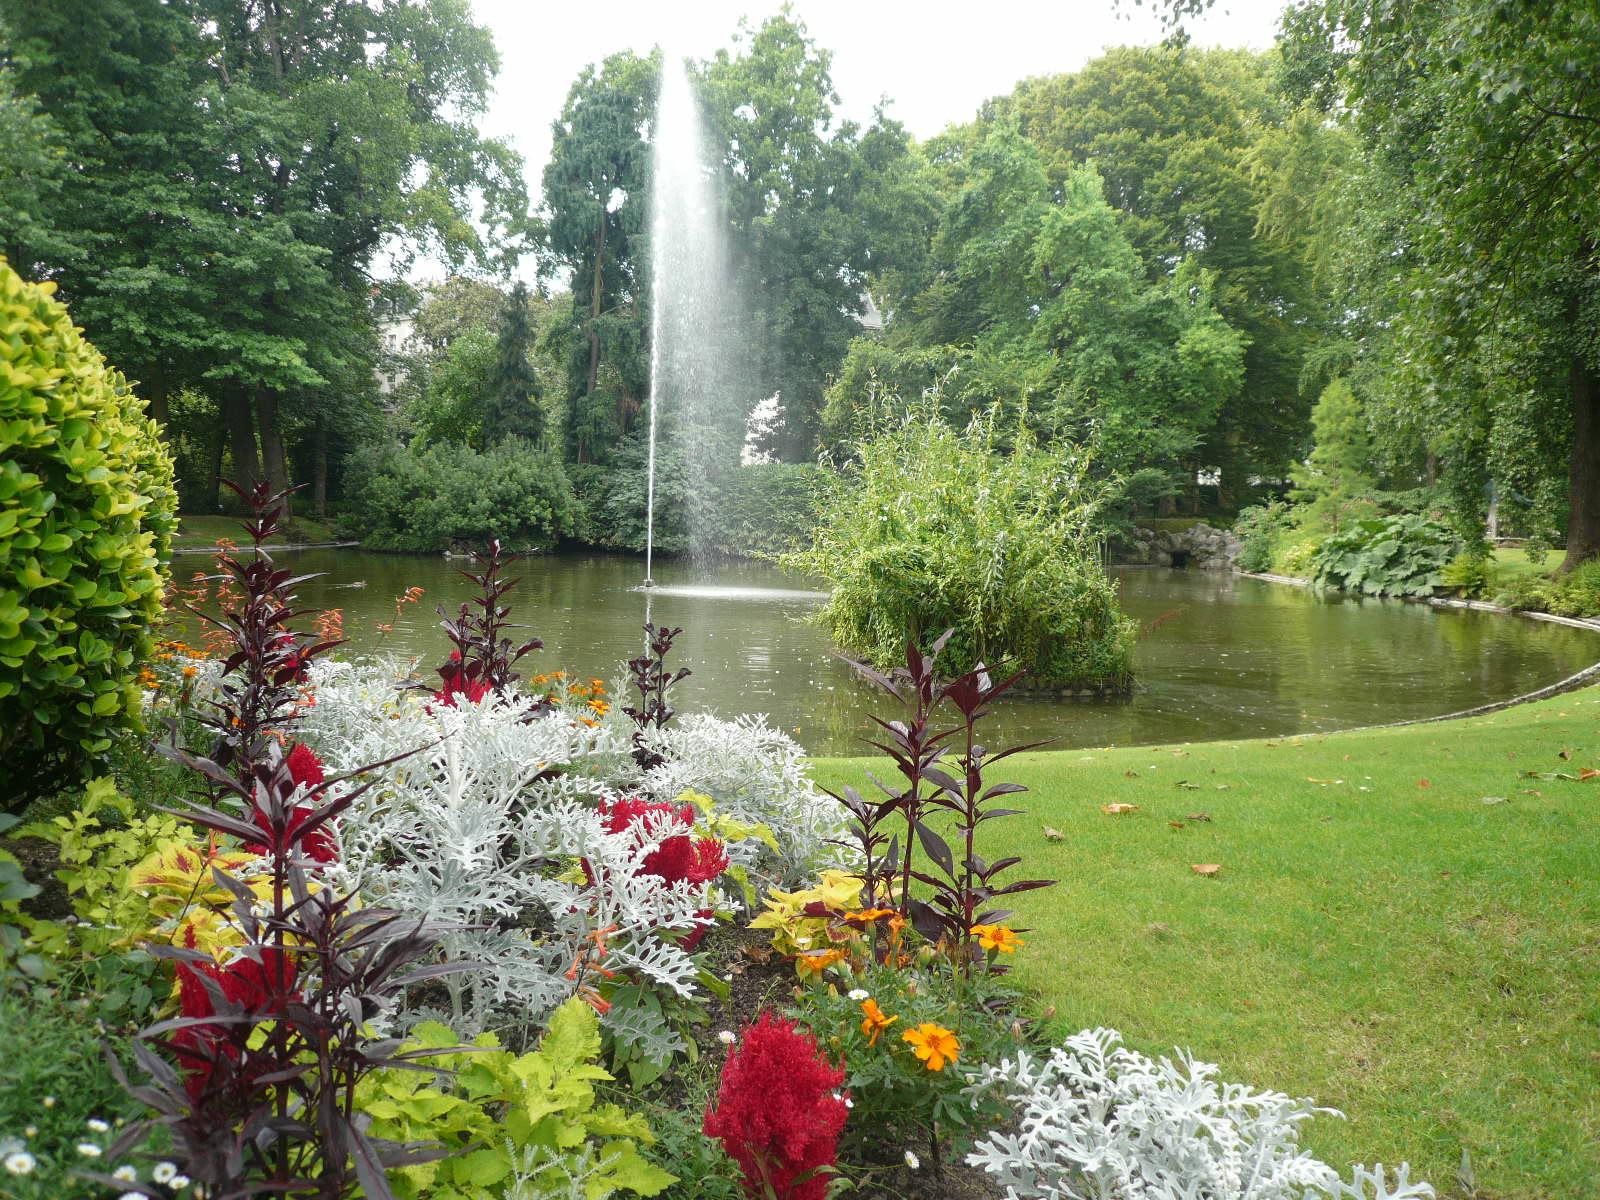 Jardin des plantes de nantes wikip dia for Jardin wikipedia